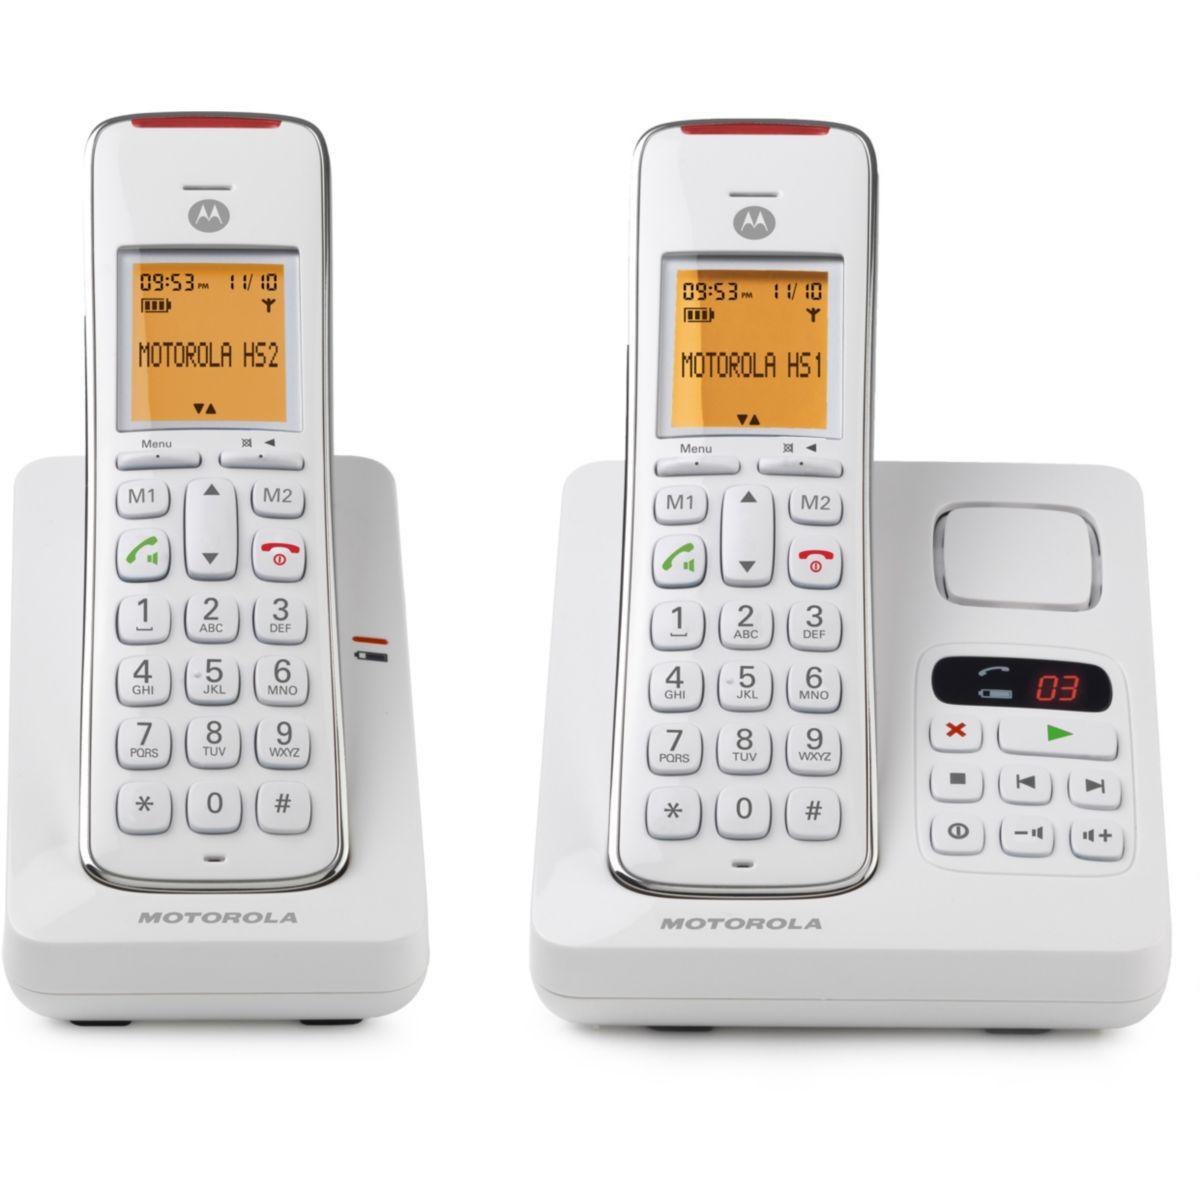 Téléphone sans fil MOTOROLA CD212 Duo Rép Blanc